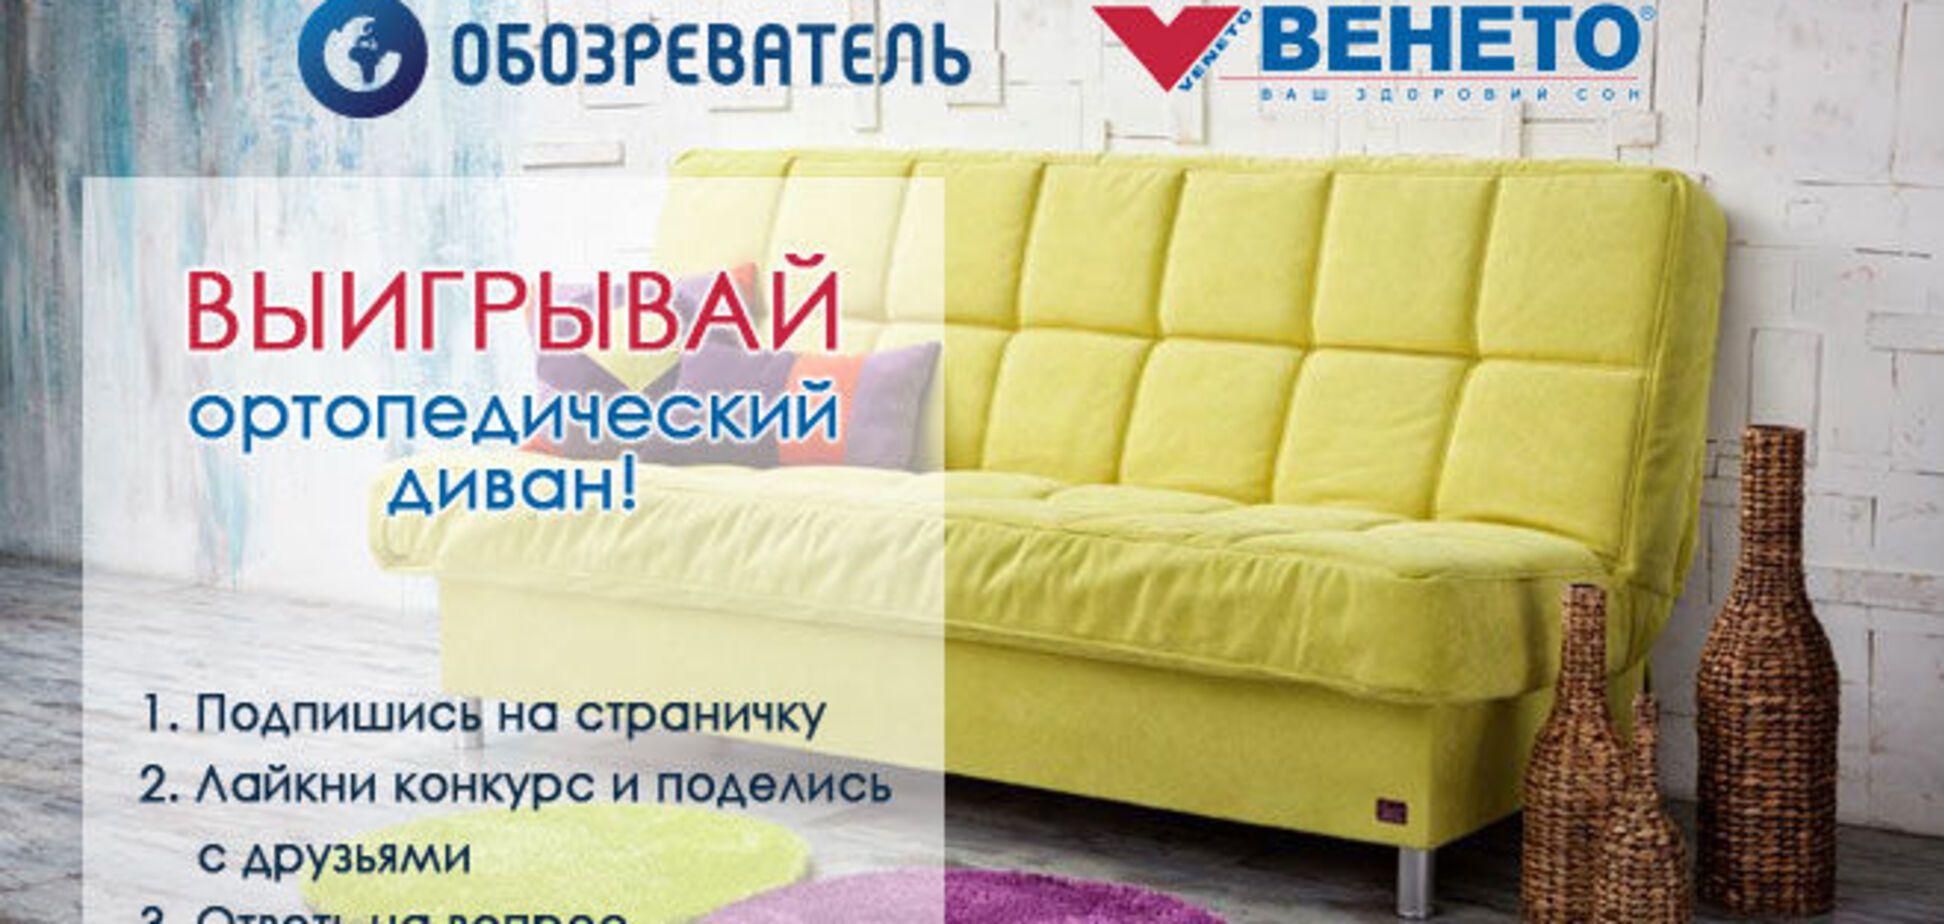 Читай 'Обозреватель' - вигравай диван!